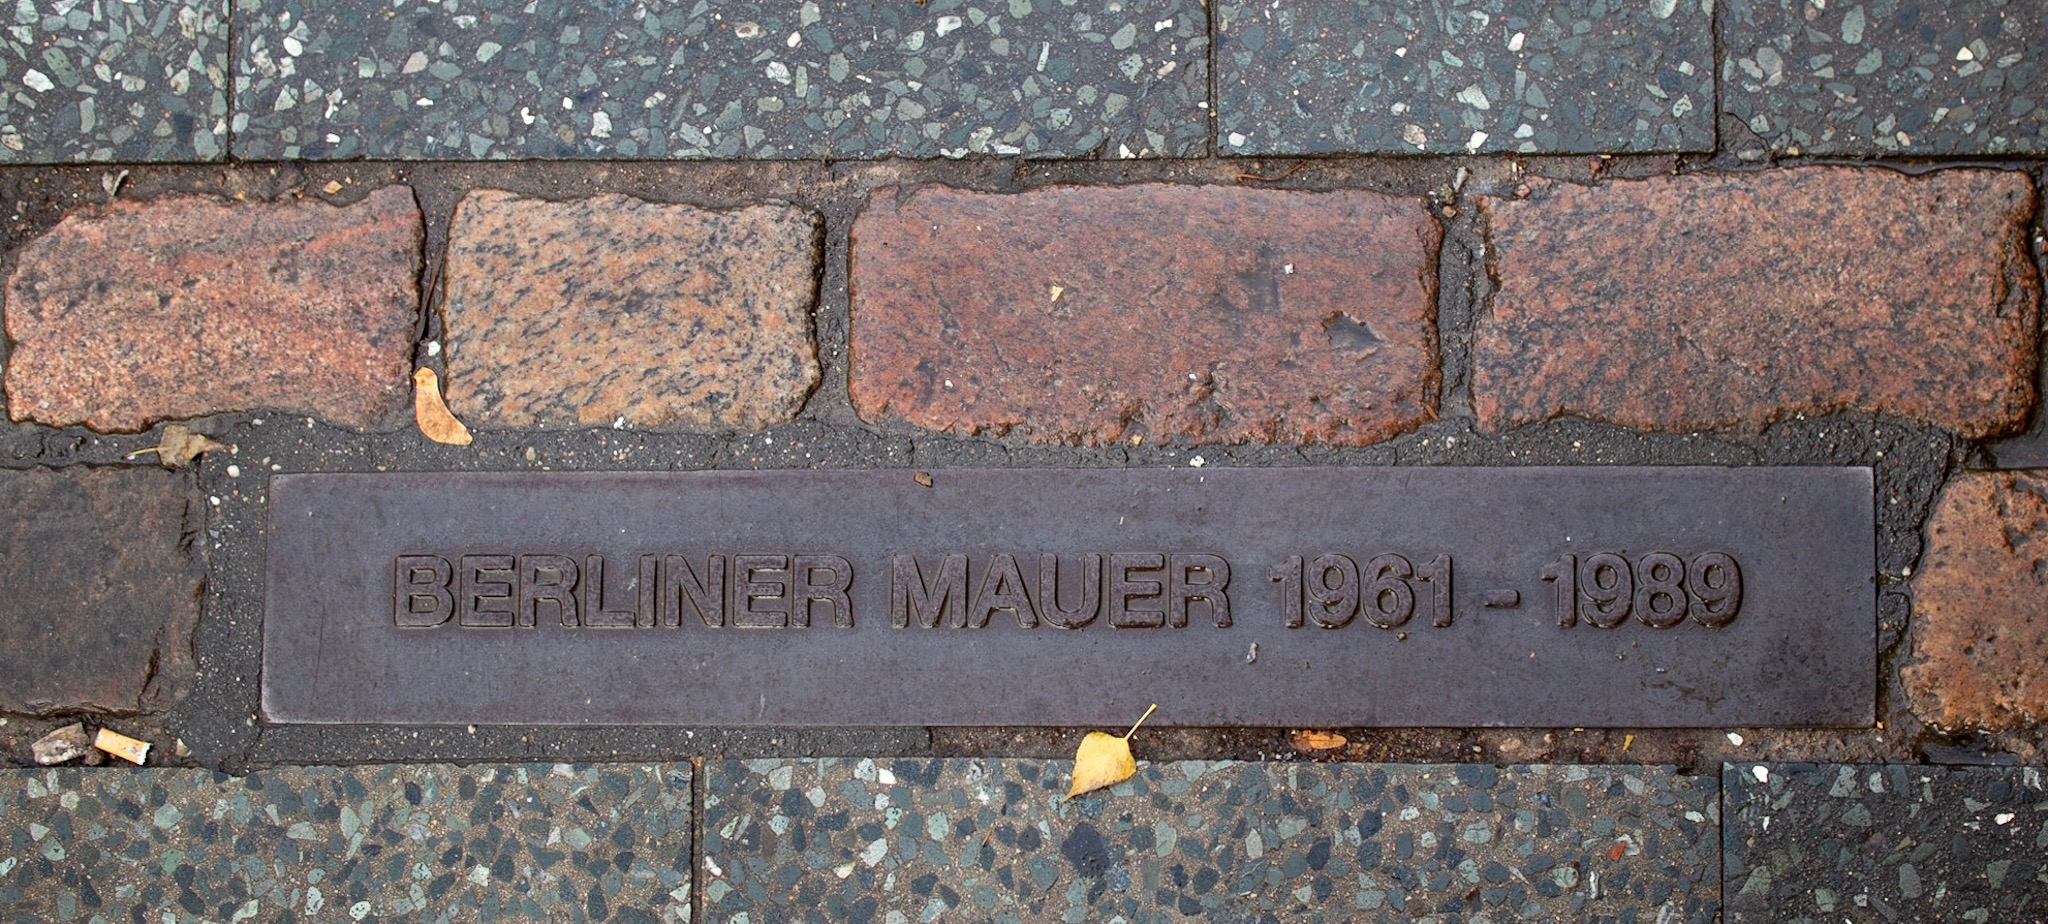 Berlin Wall Brick